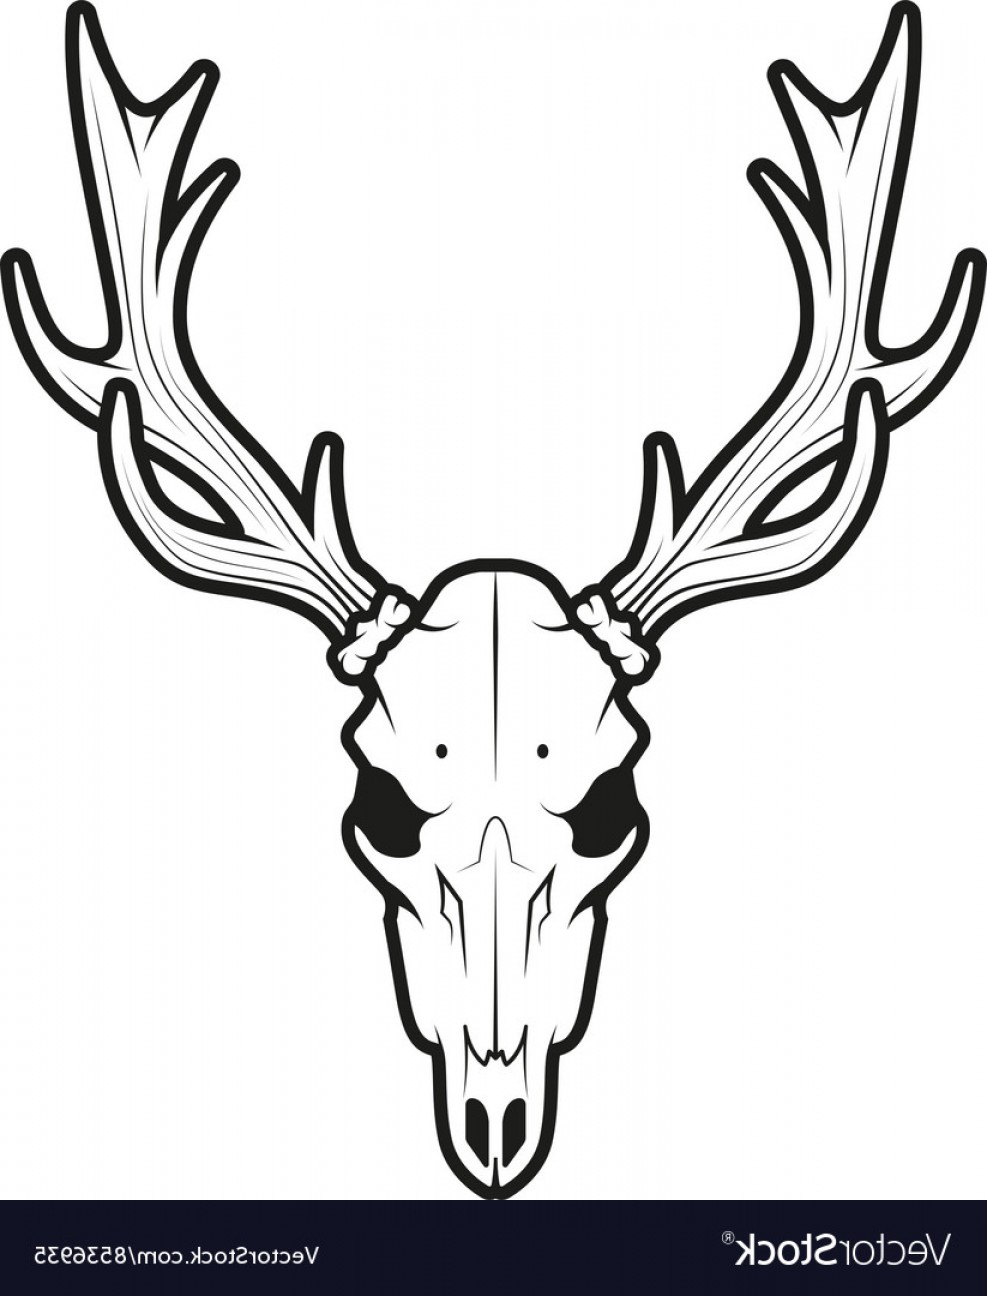 Deer skull clipart black and white vector image free Elk Skull Vector   SarahGardan image free